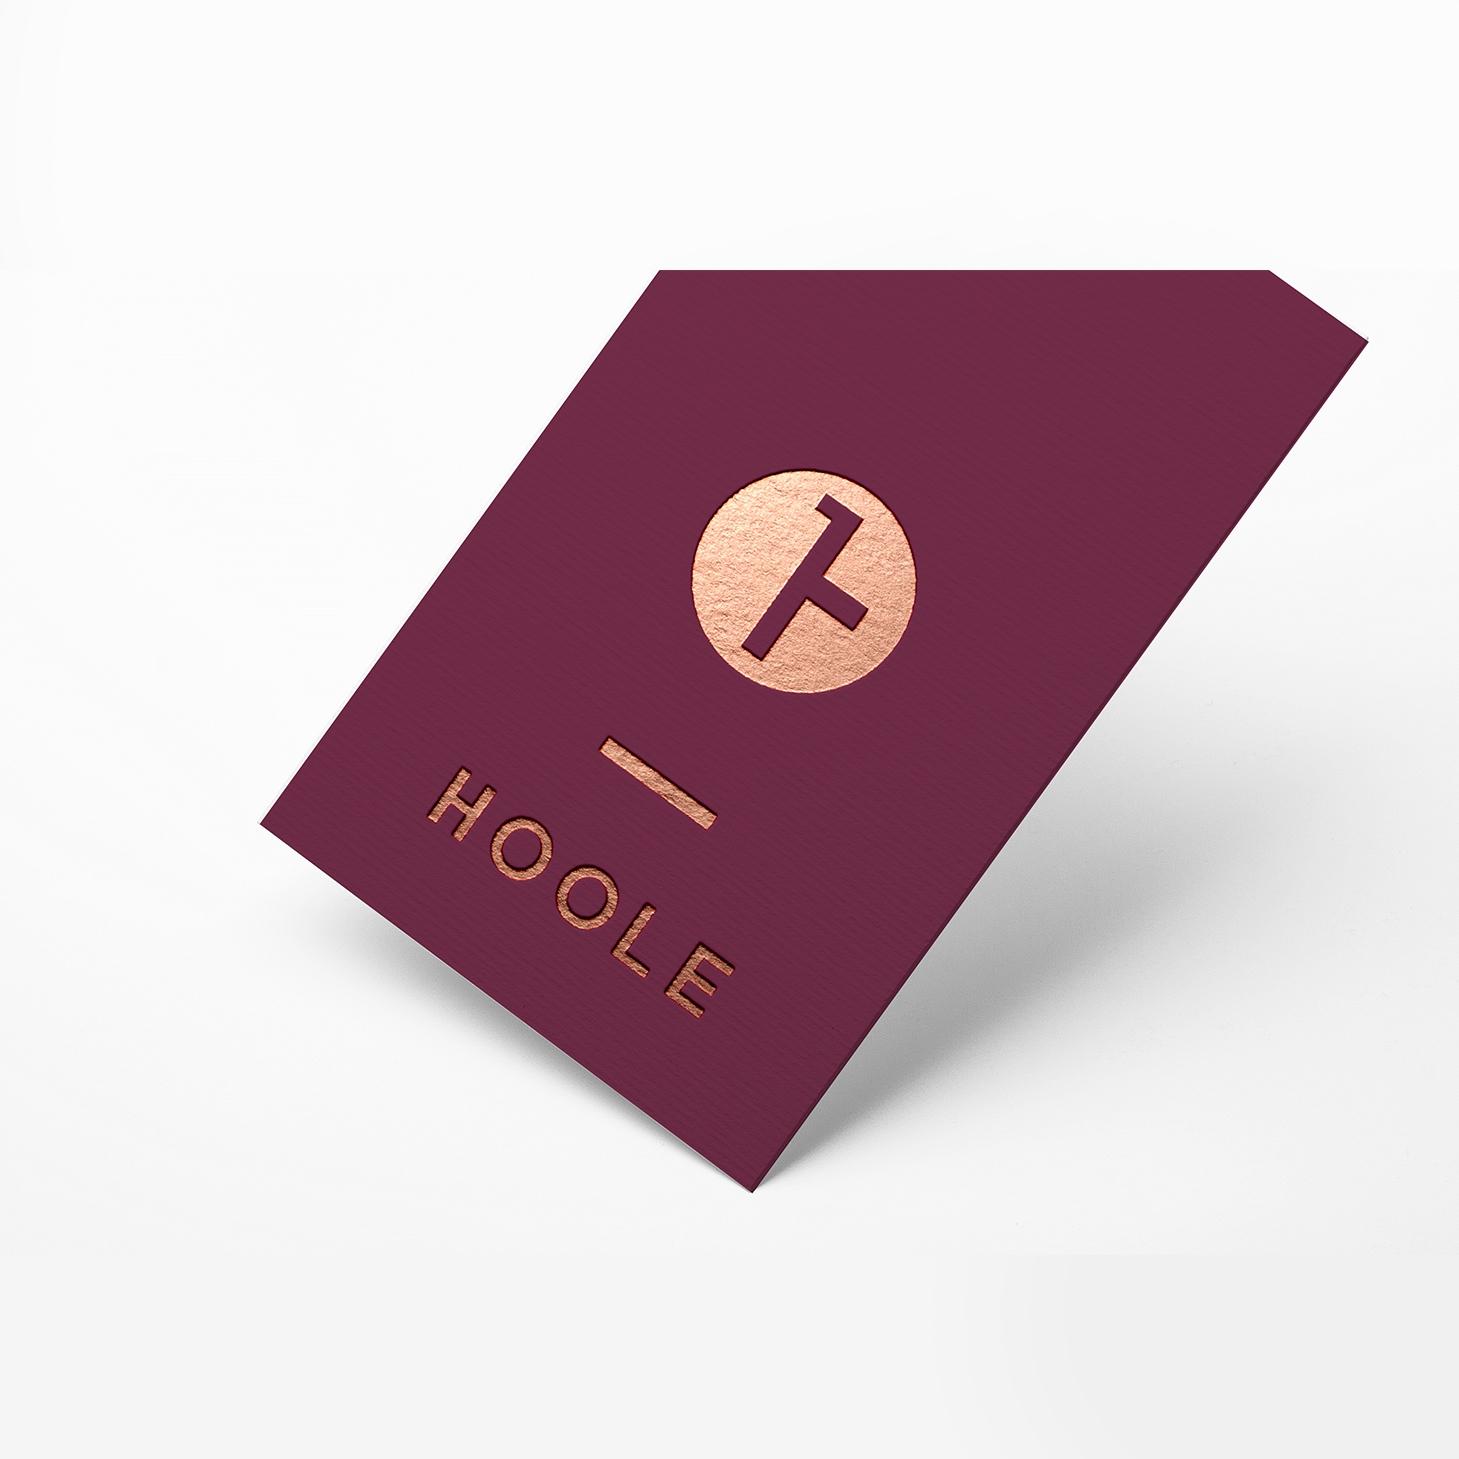 HOOLE_Logo